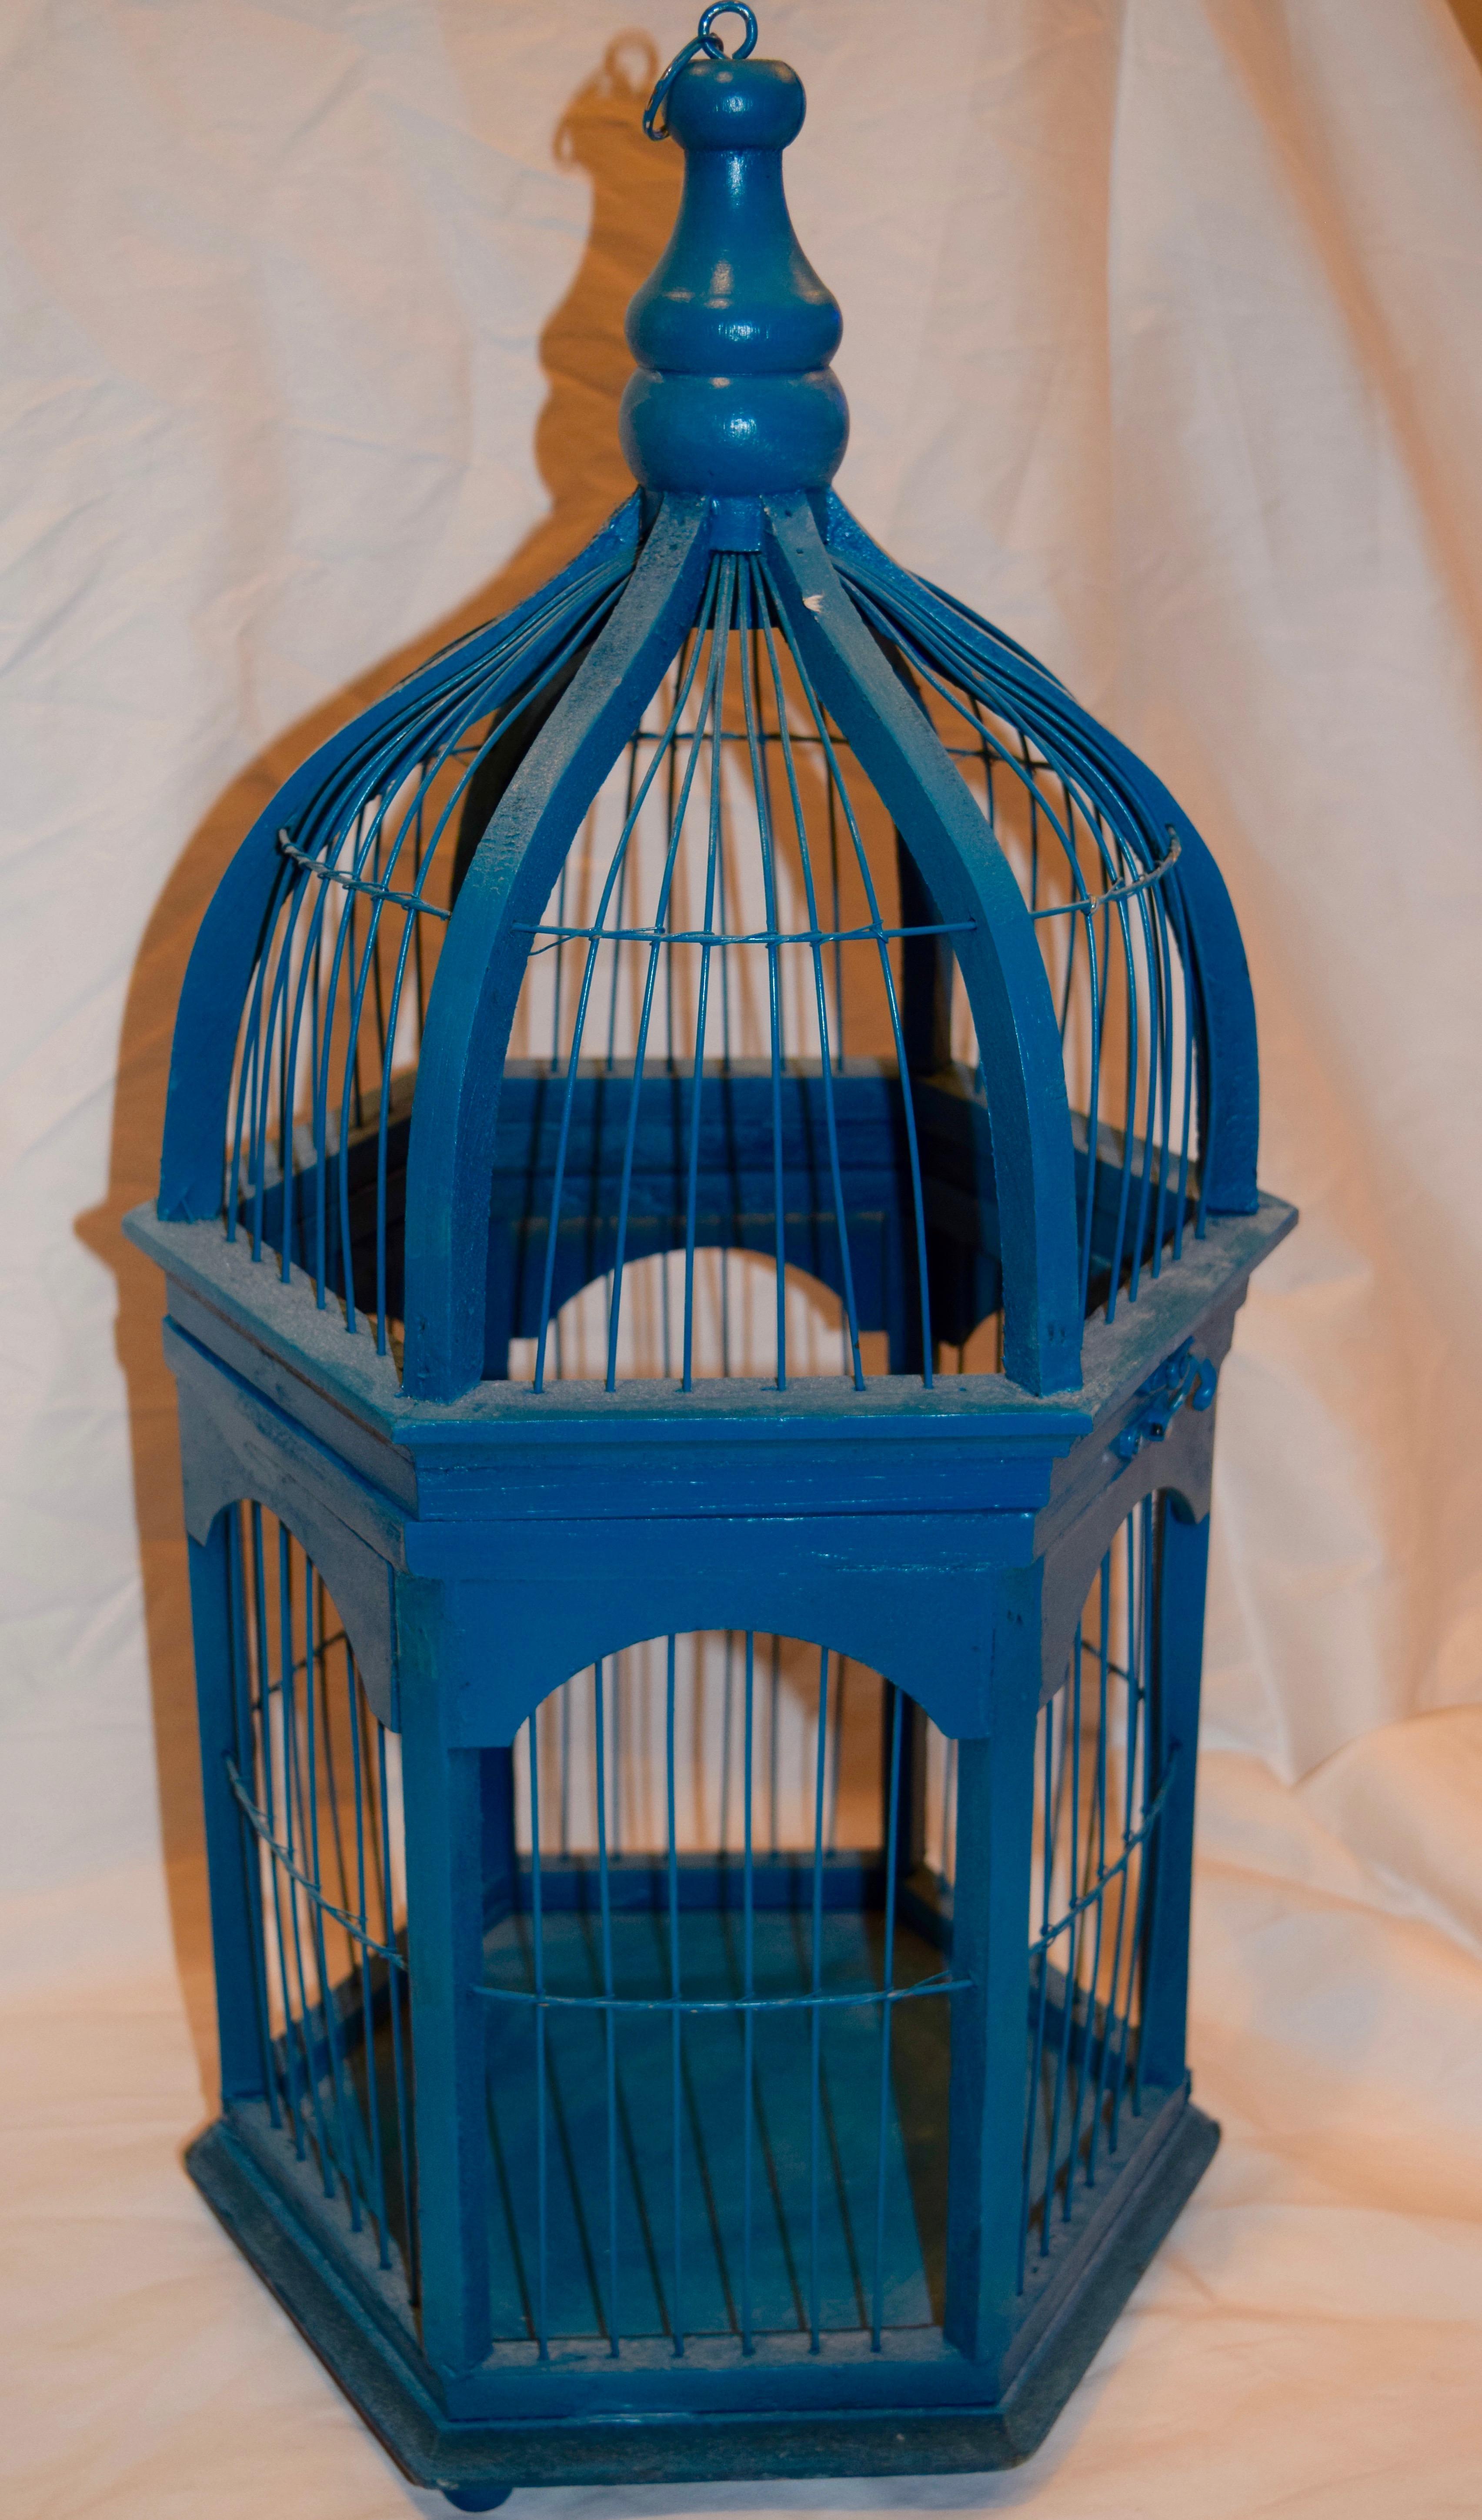 Blue Birdcage #2